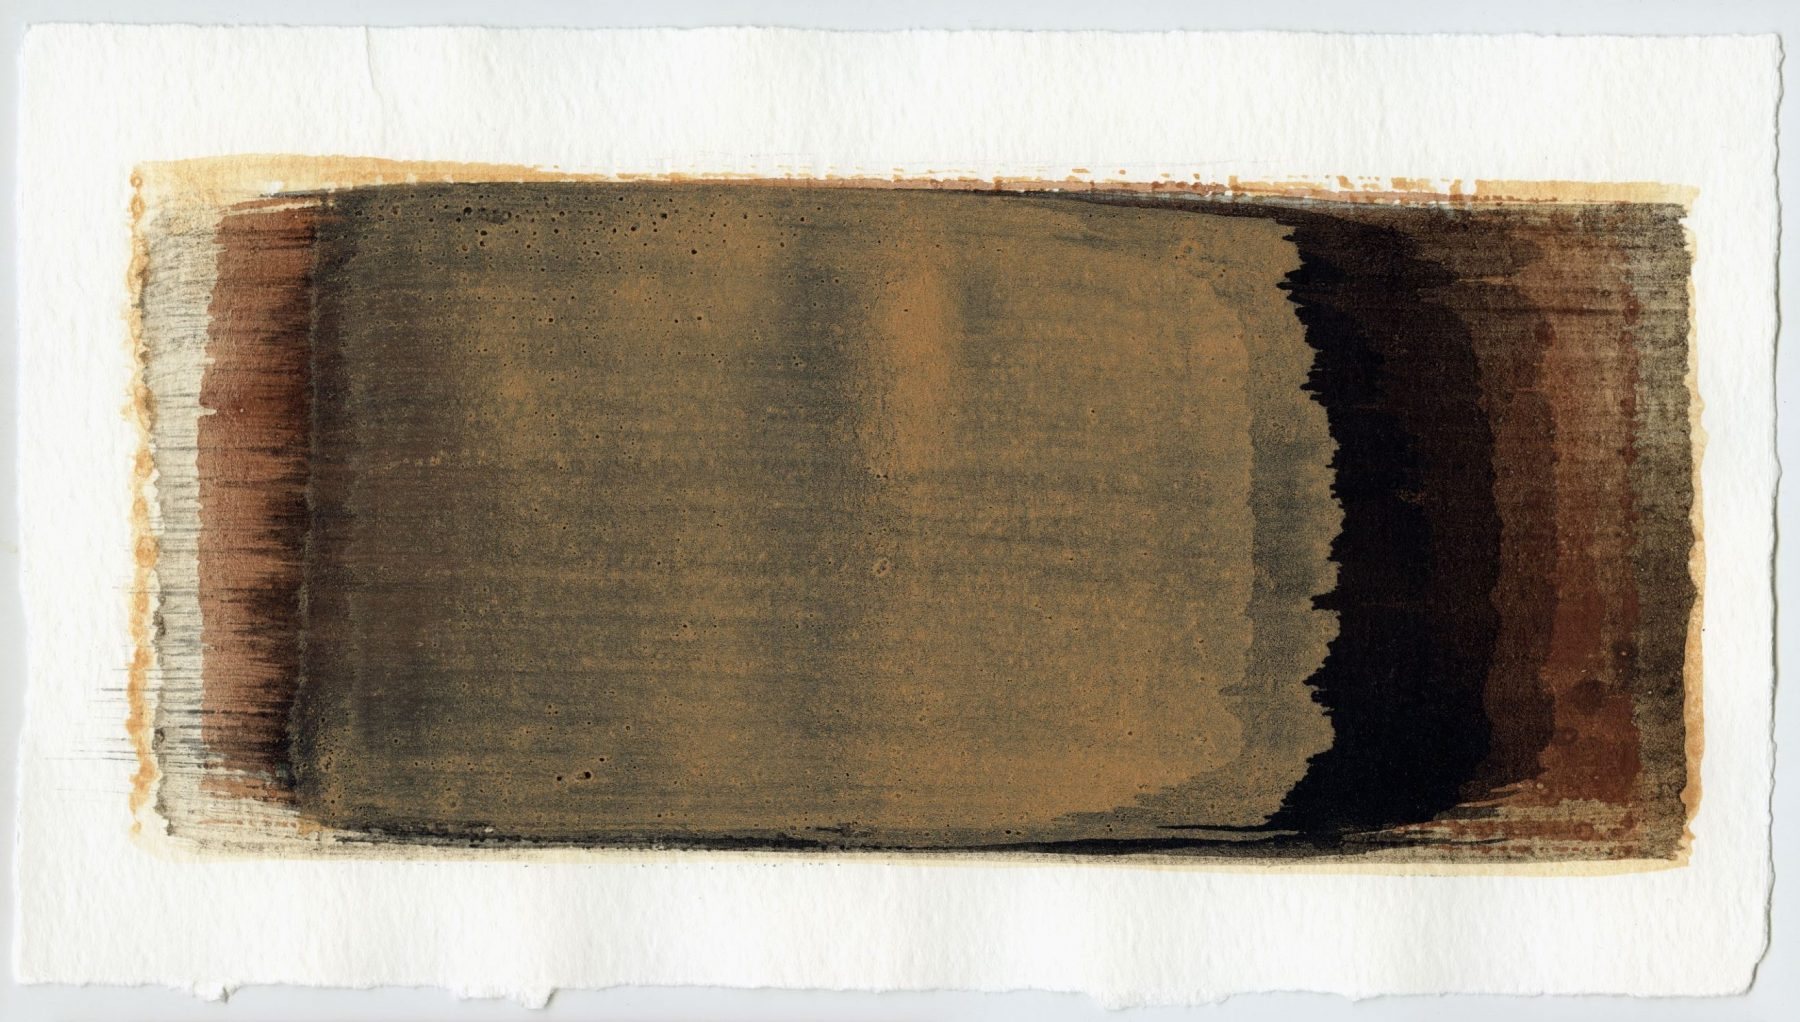 Brush stroke no. 23 - SOLD - Selfmade pigment: Boekels roze, Mortelse oker gebrand, Slingerpad zwart, Perekker roze